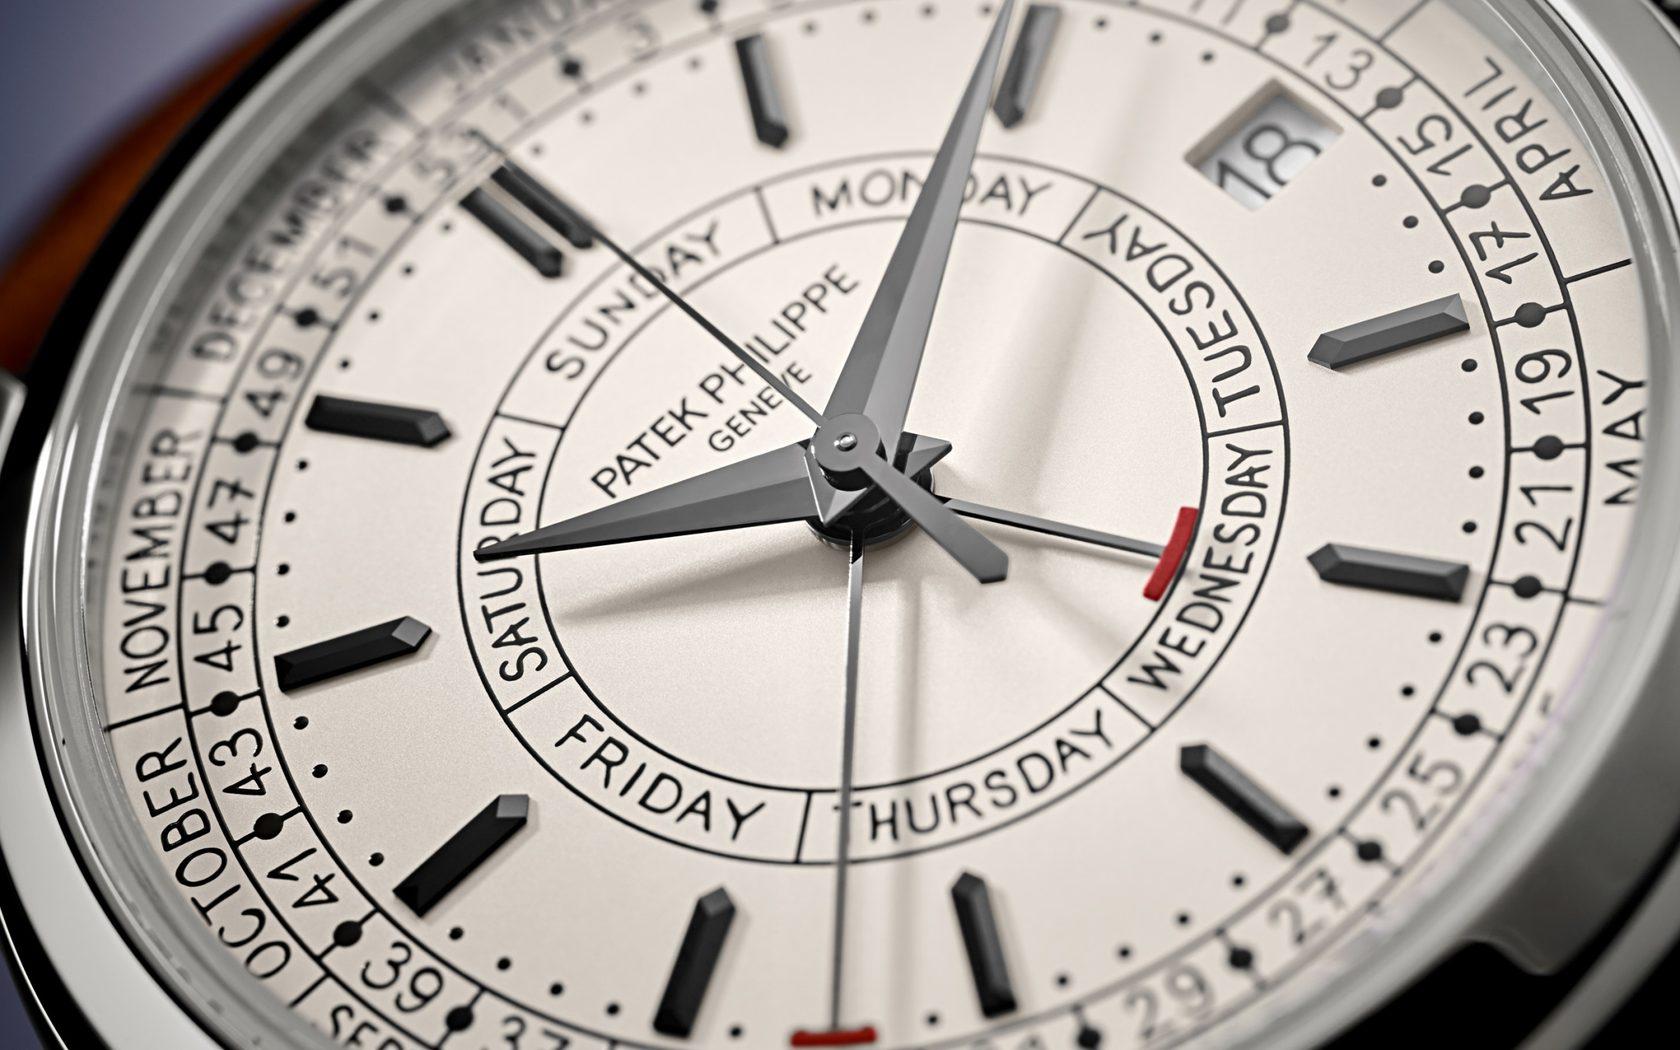 Продать Patek Philippe - Часовой ломбард Patek Philippe